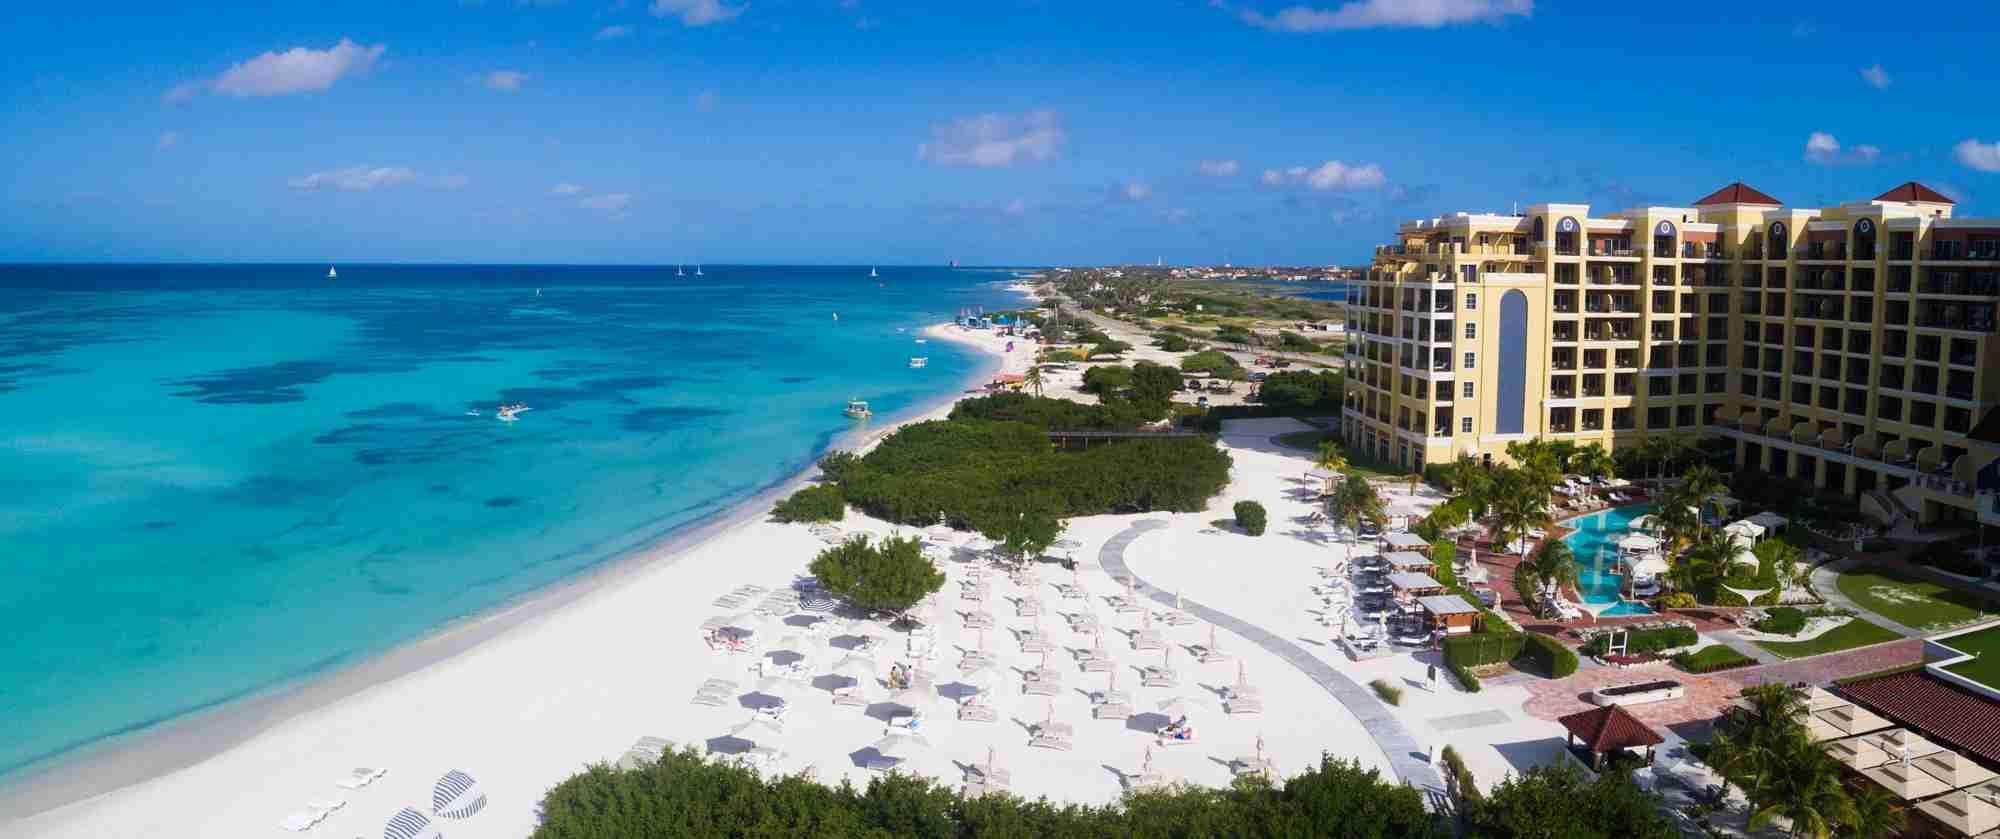 The Ritz-Carlton, Aruba (Photo by Trey Ratcliff)